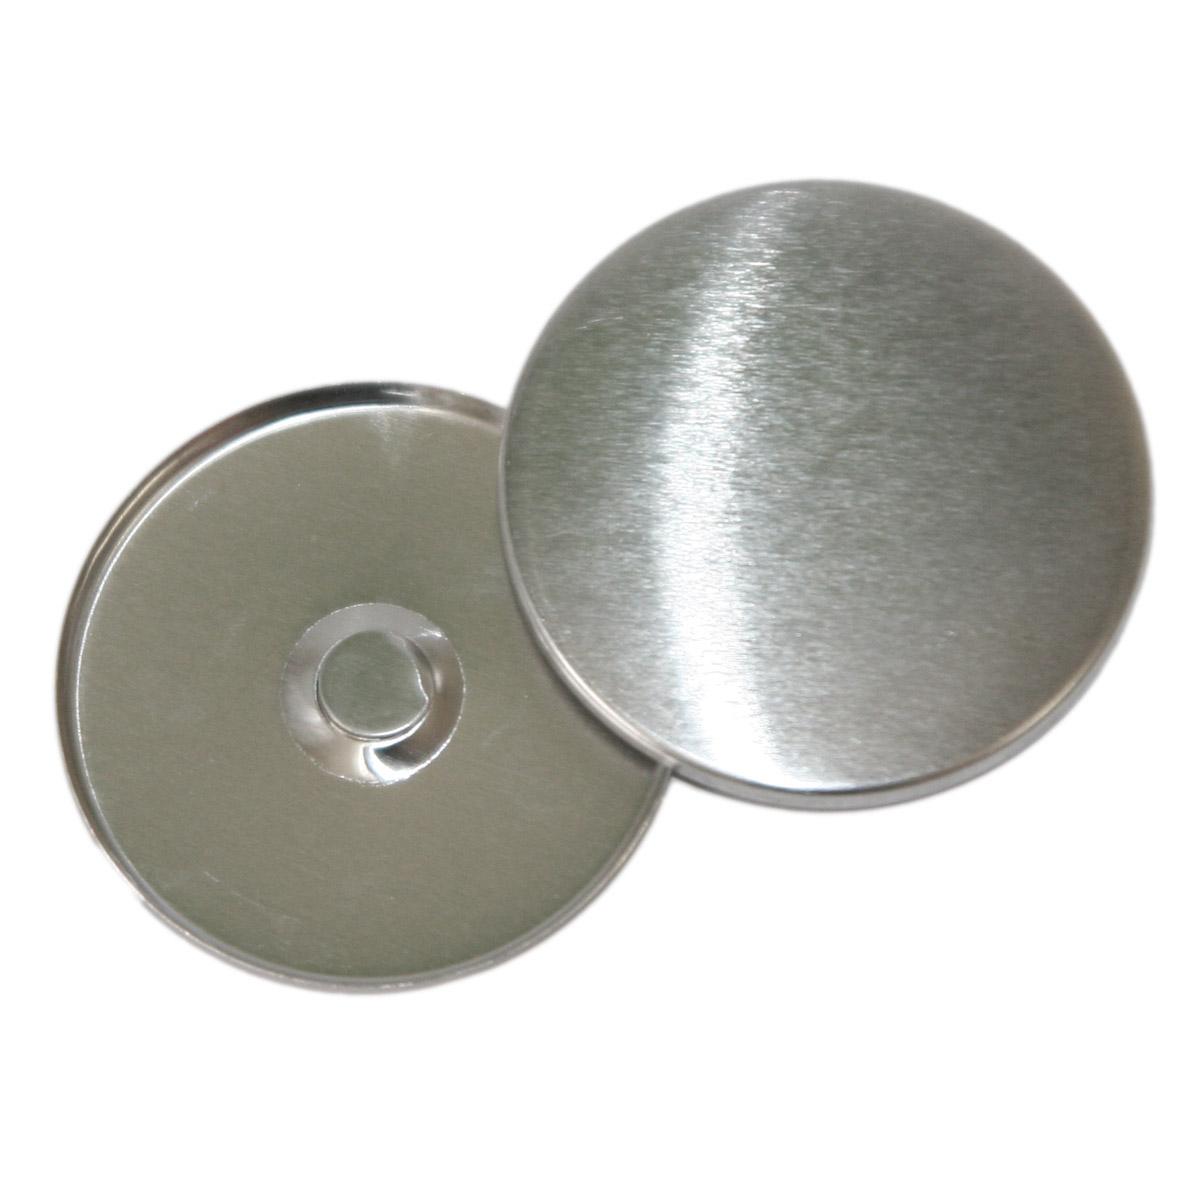 Components to badge machine with neodymium magnet